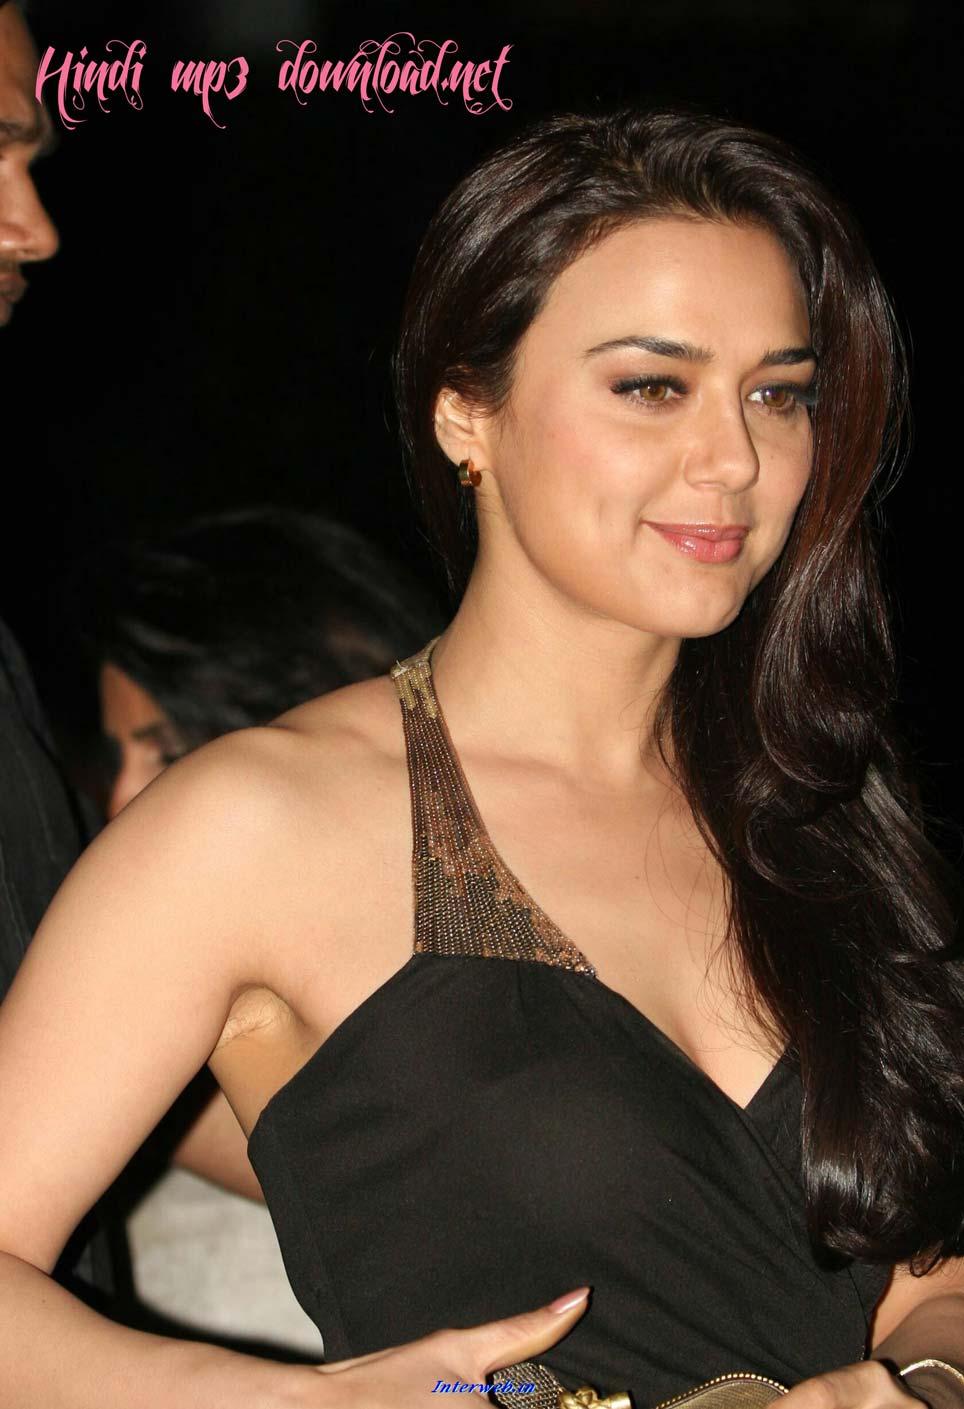 Preity Zinta nudes (43 photos), photo Sexy, Twitter, underwear 2017